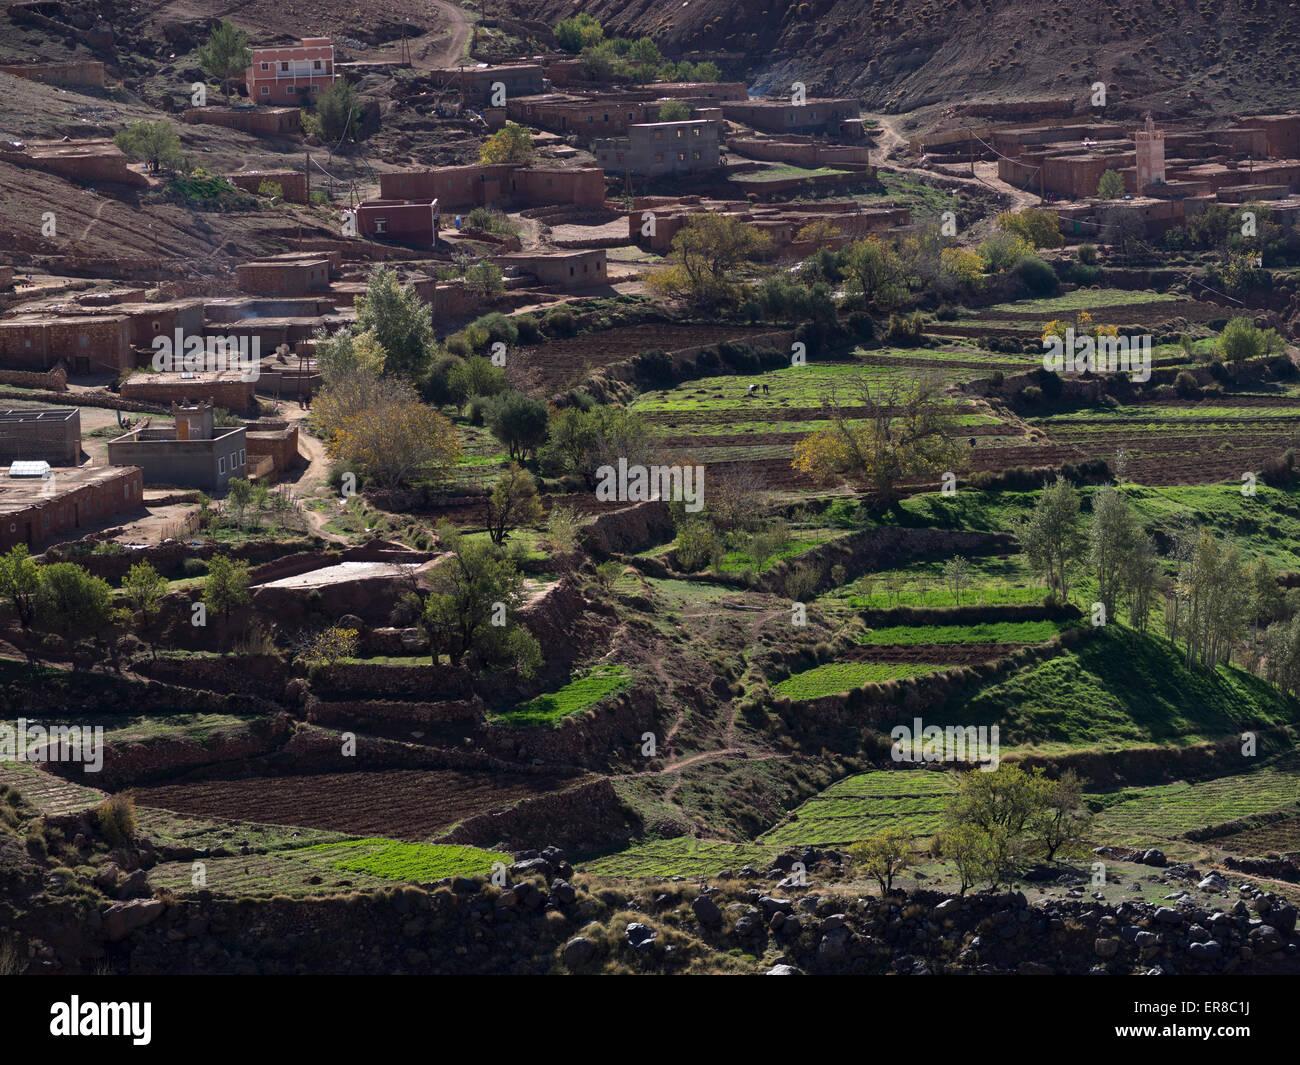 Terraced field in Morocco. - Stock Image